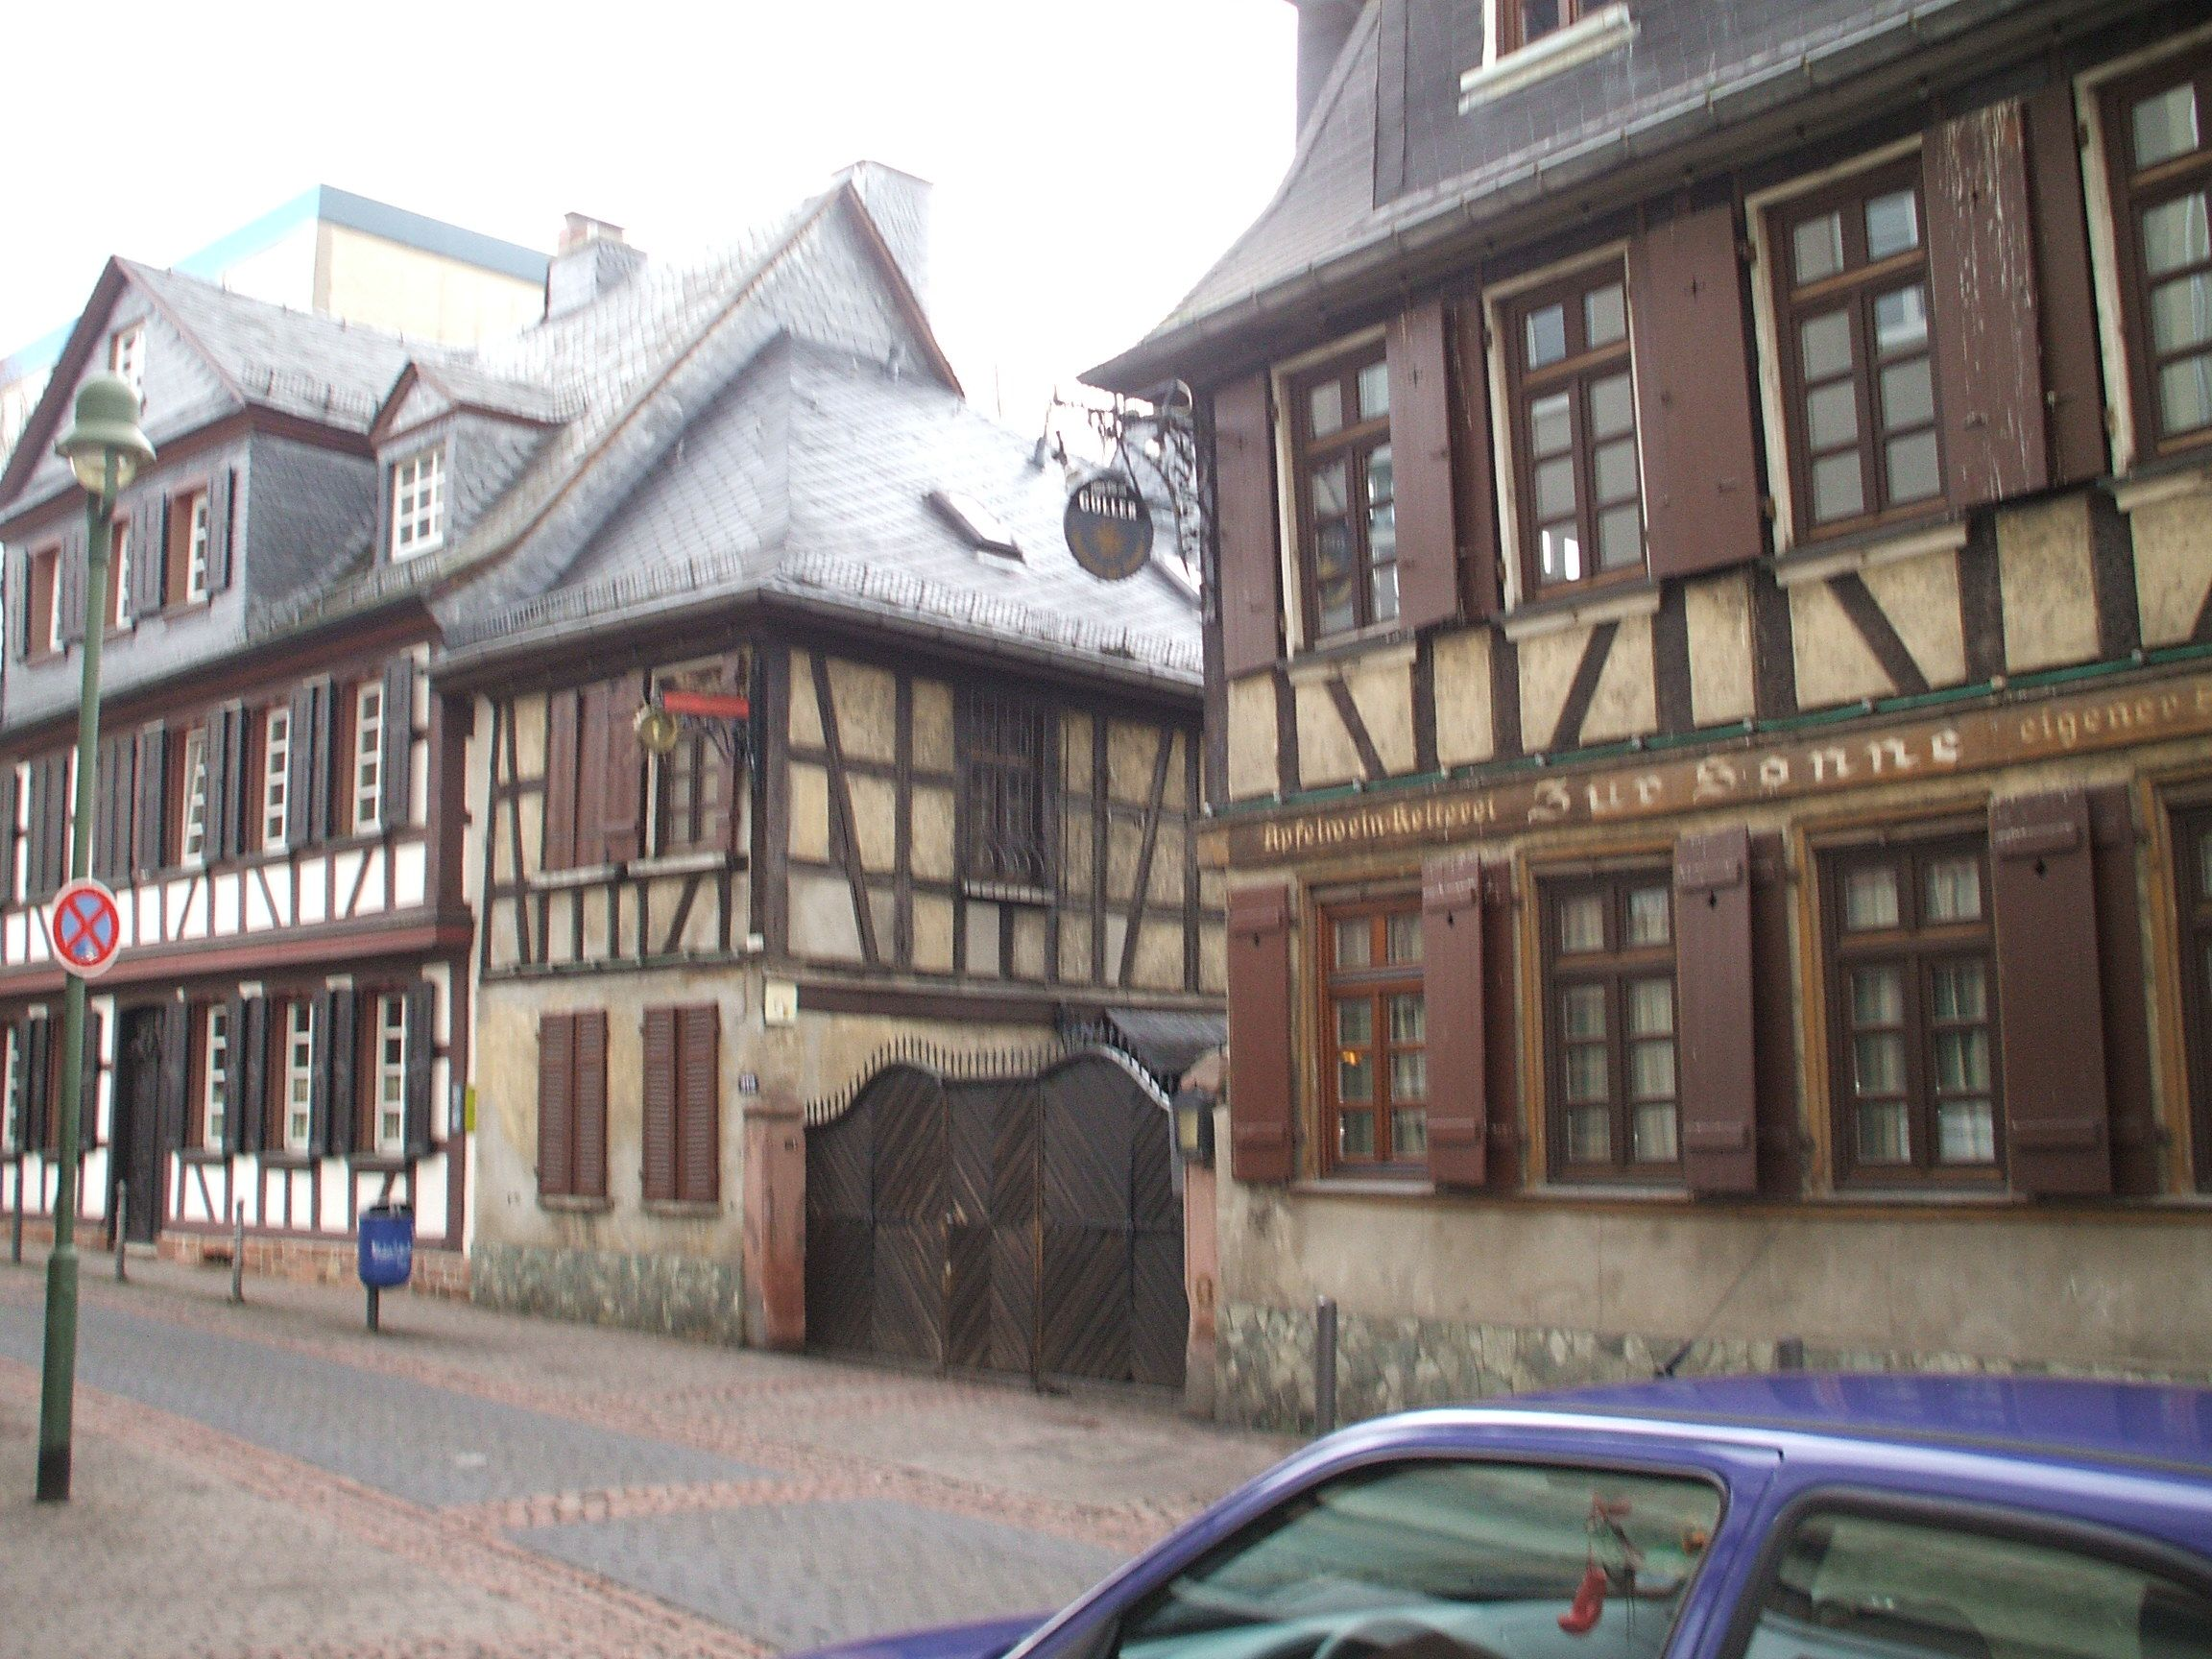 bornheim hesse germany places i have traveled. Black Bedroom Furniture Sets. Home Design Ideas